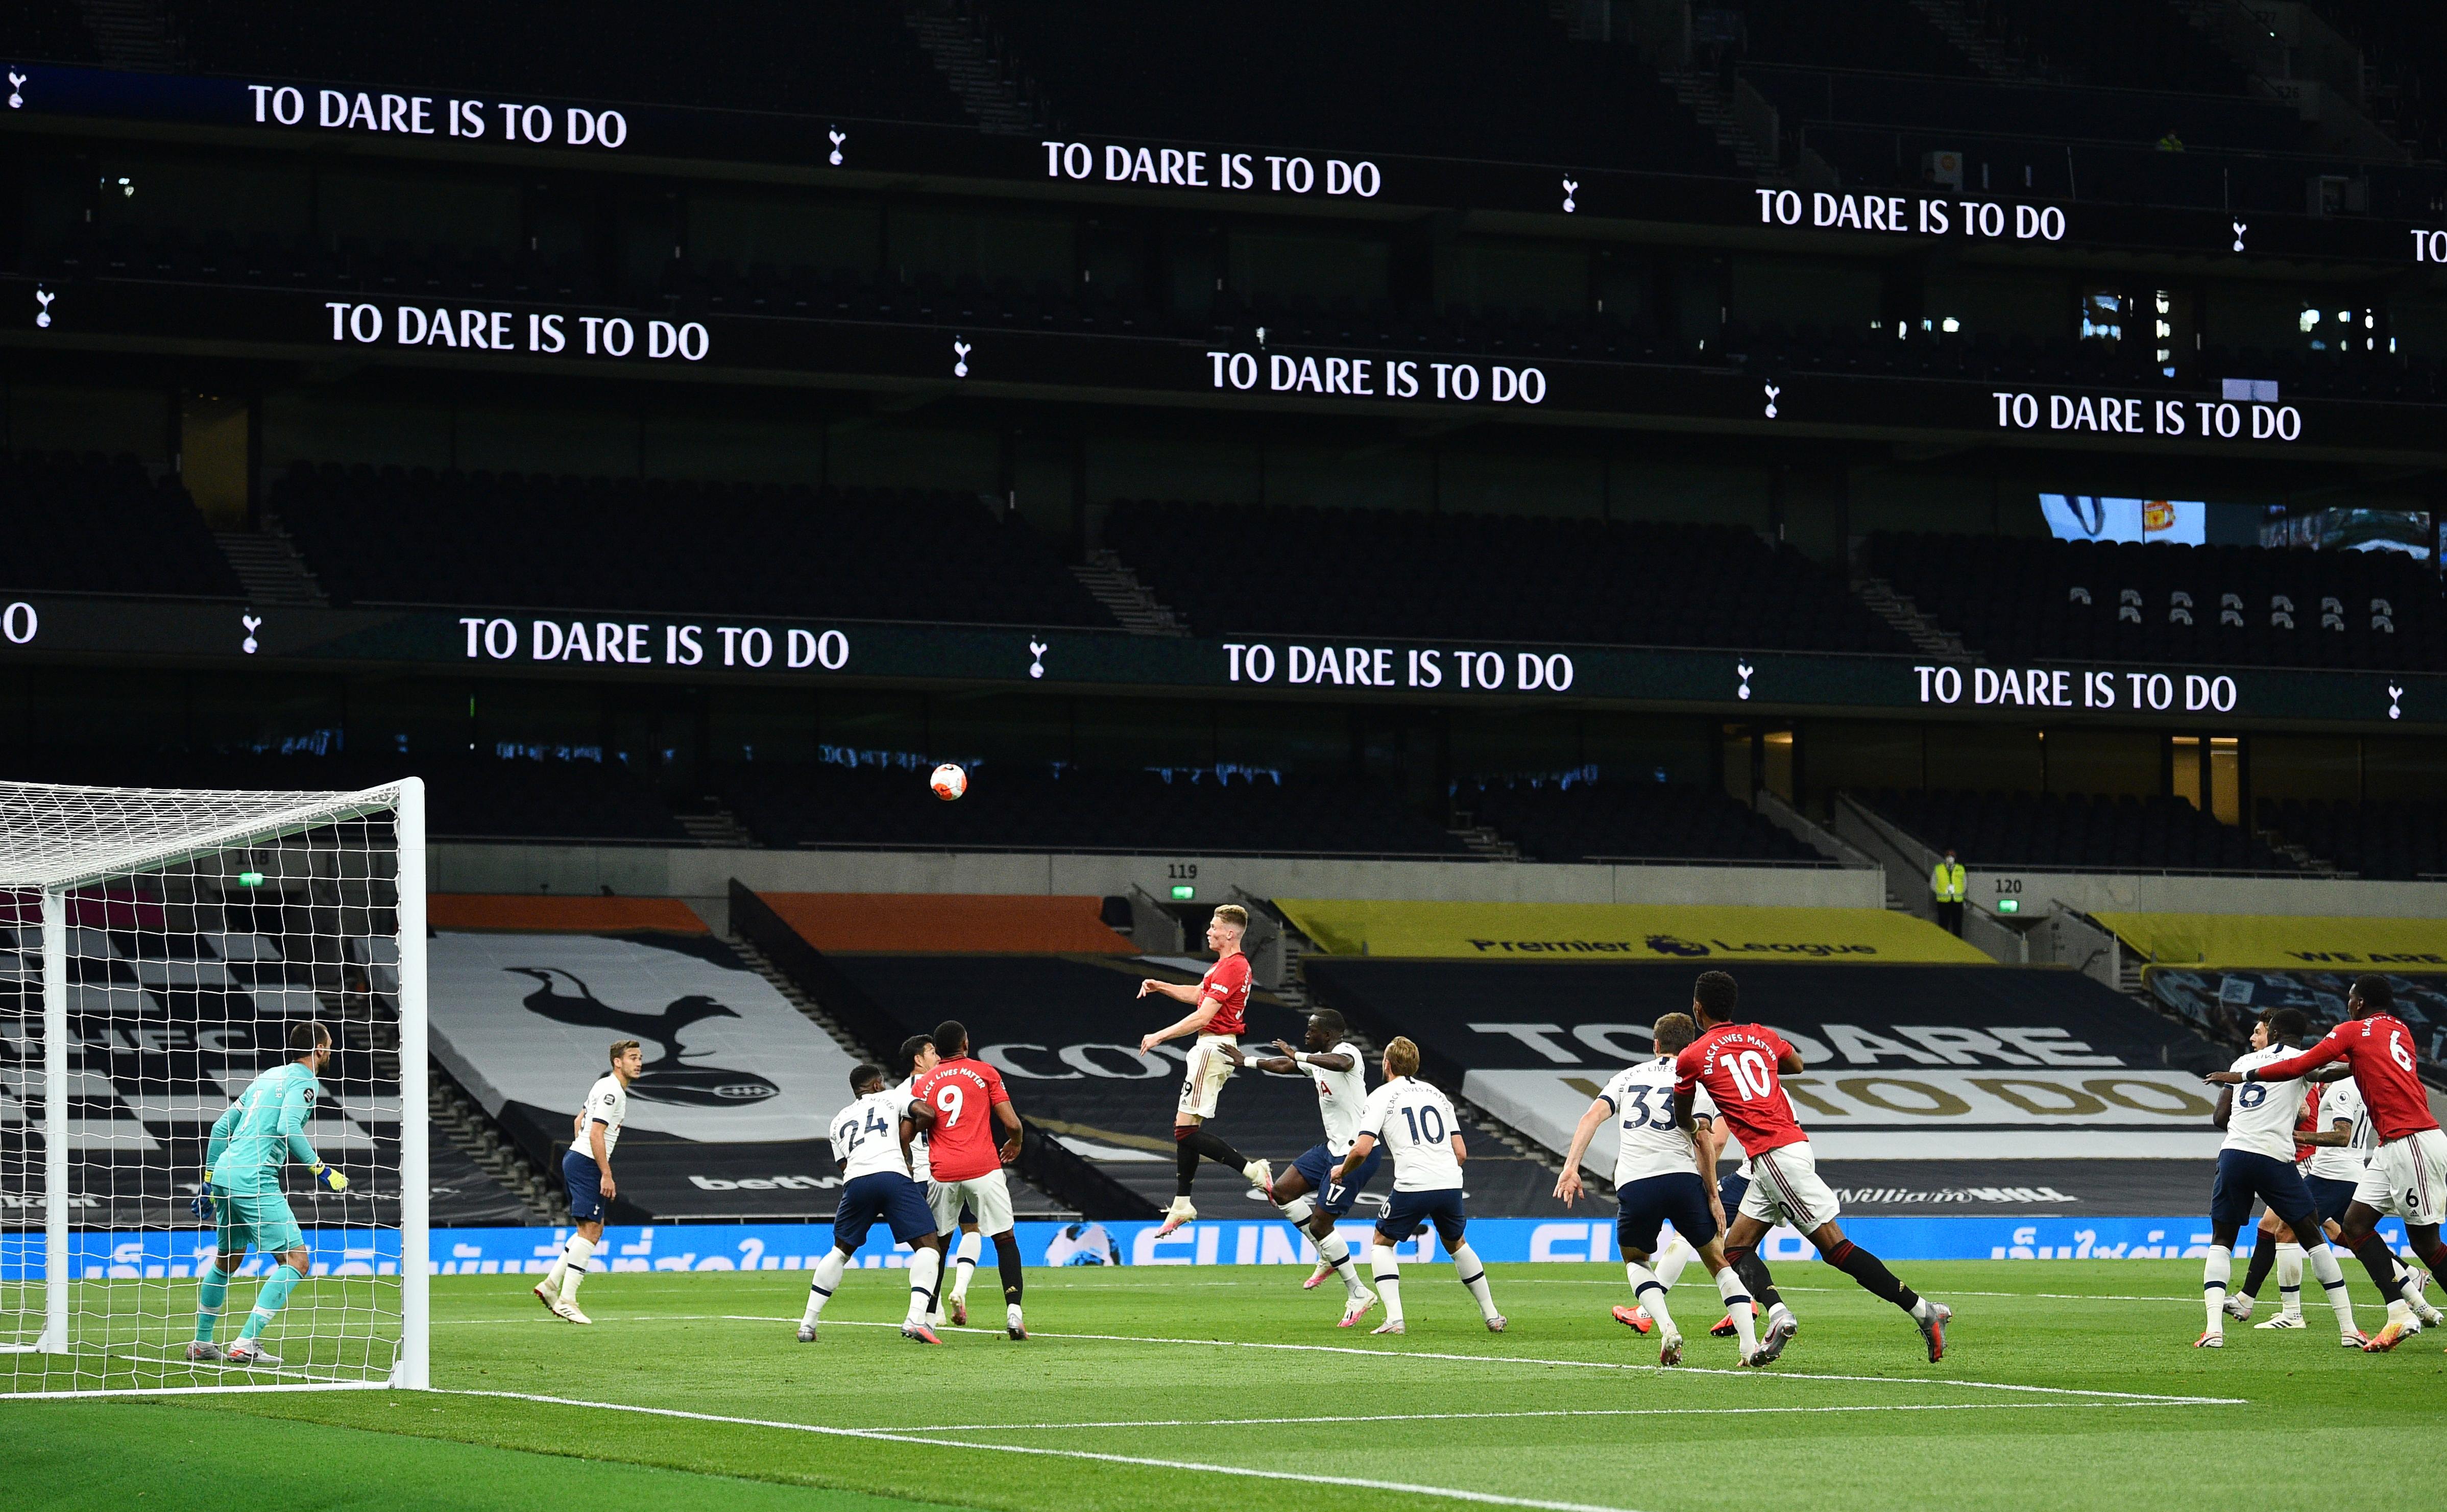 Тоттенхэм МЮ онлайн трансляция - смотреть онлайн матч 19.06.2020